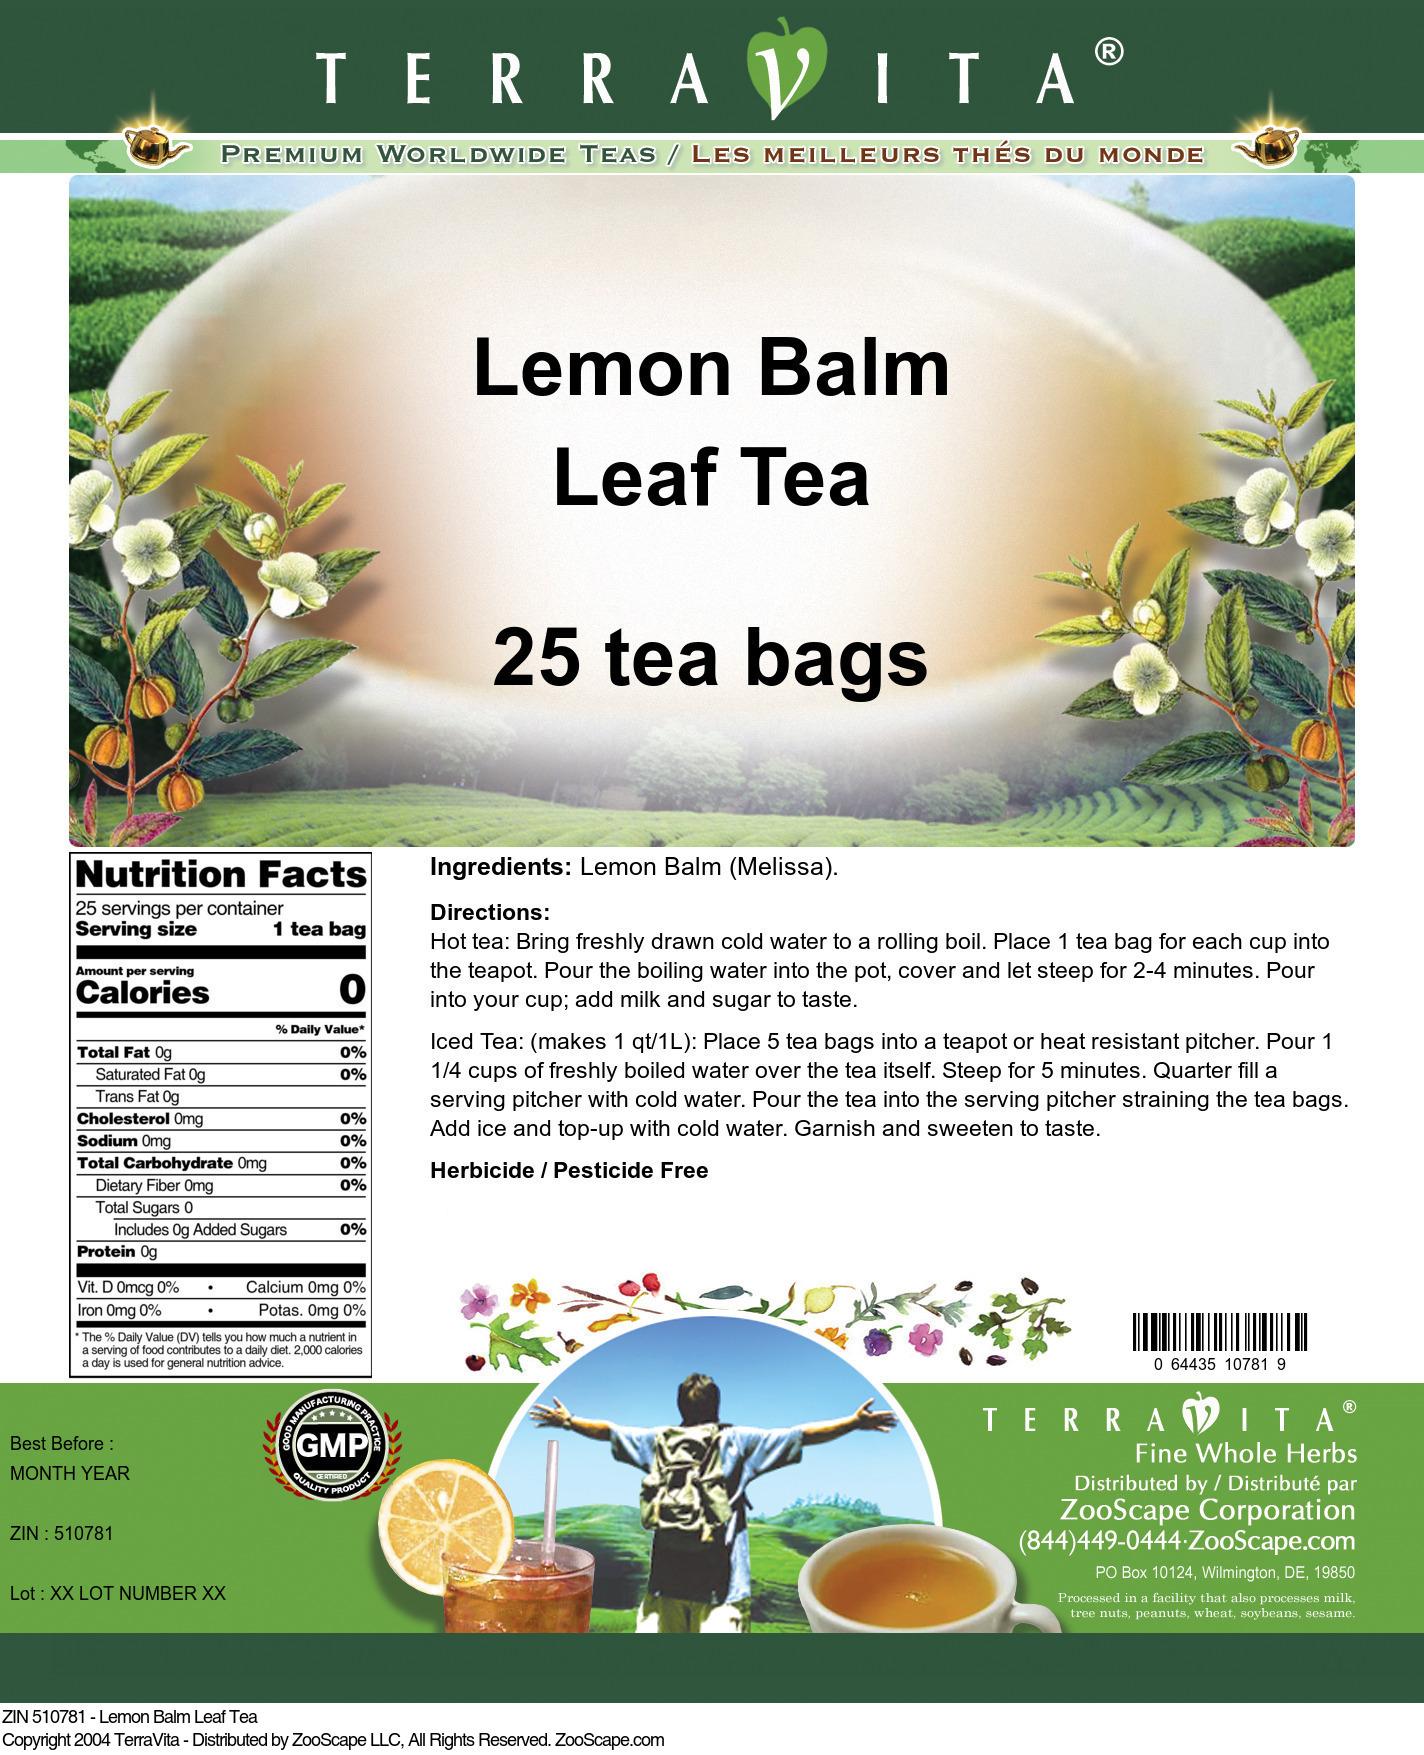 Lemon Balm Leaf Tea - Label